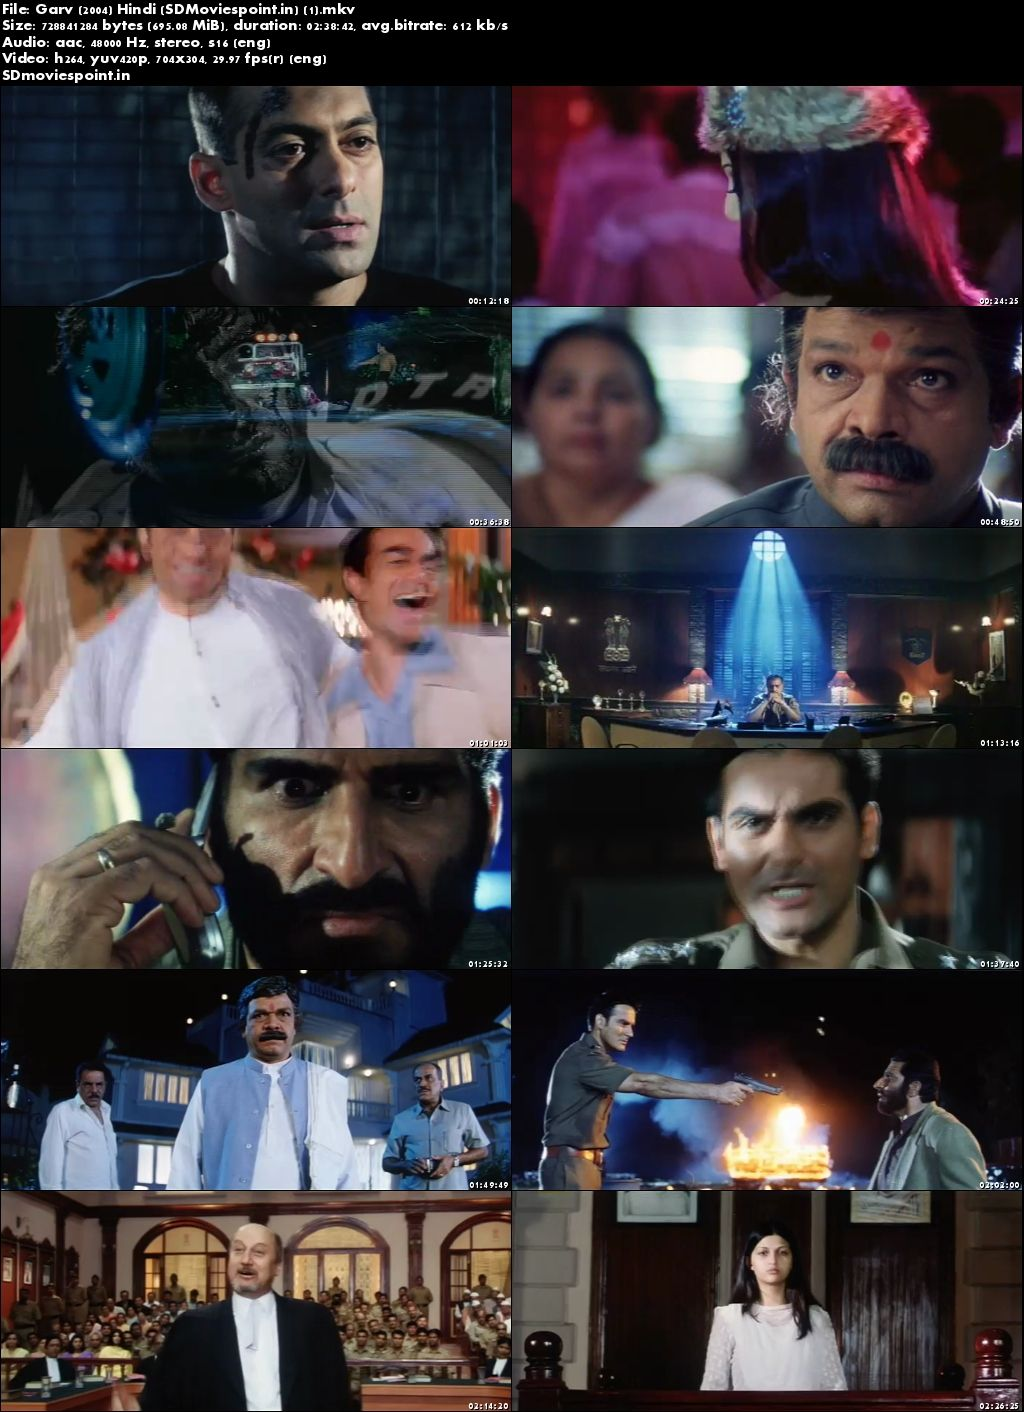 Screen Shots Garv (2004) Full HD Movie Download in Hindi 720p Blu-Ray